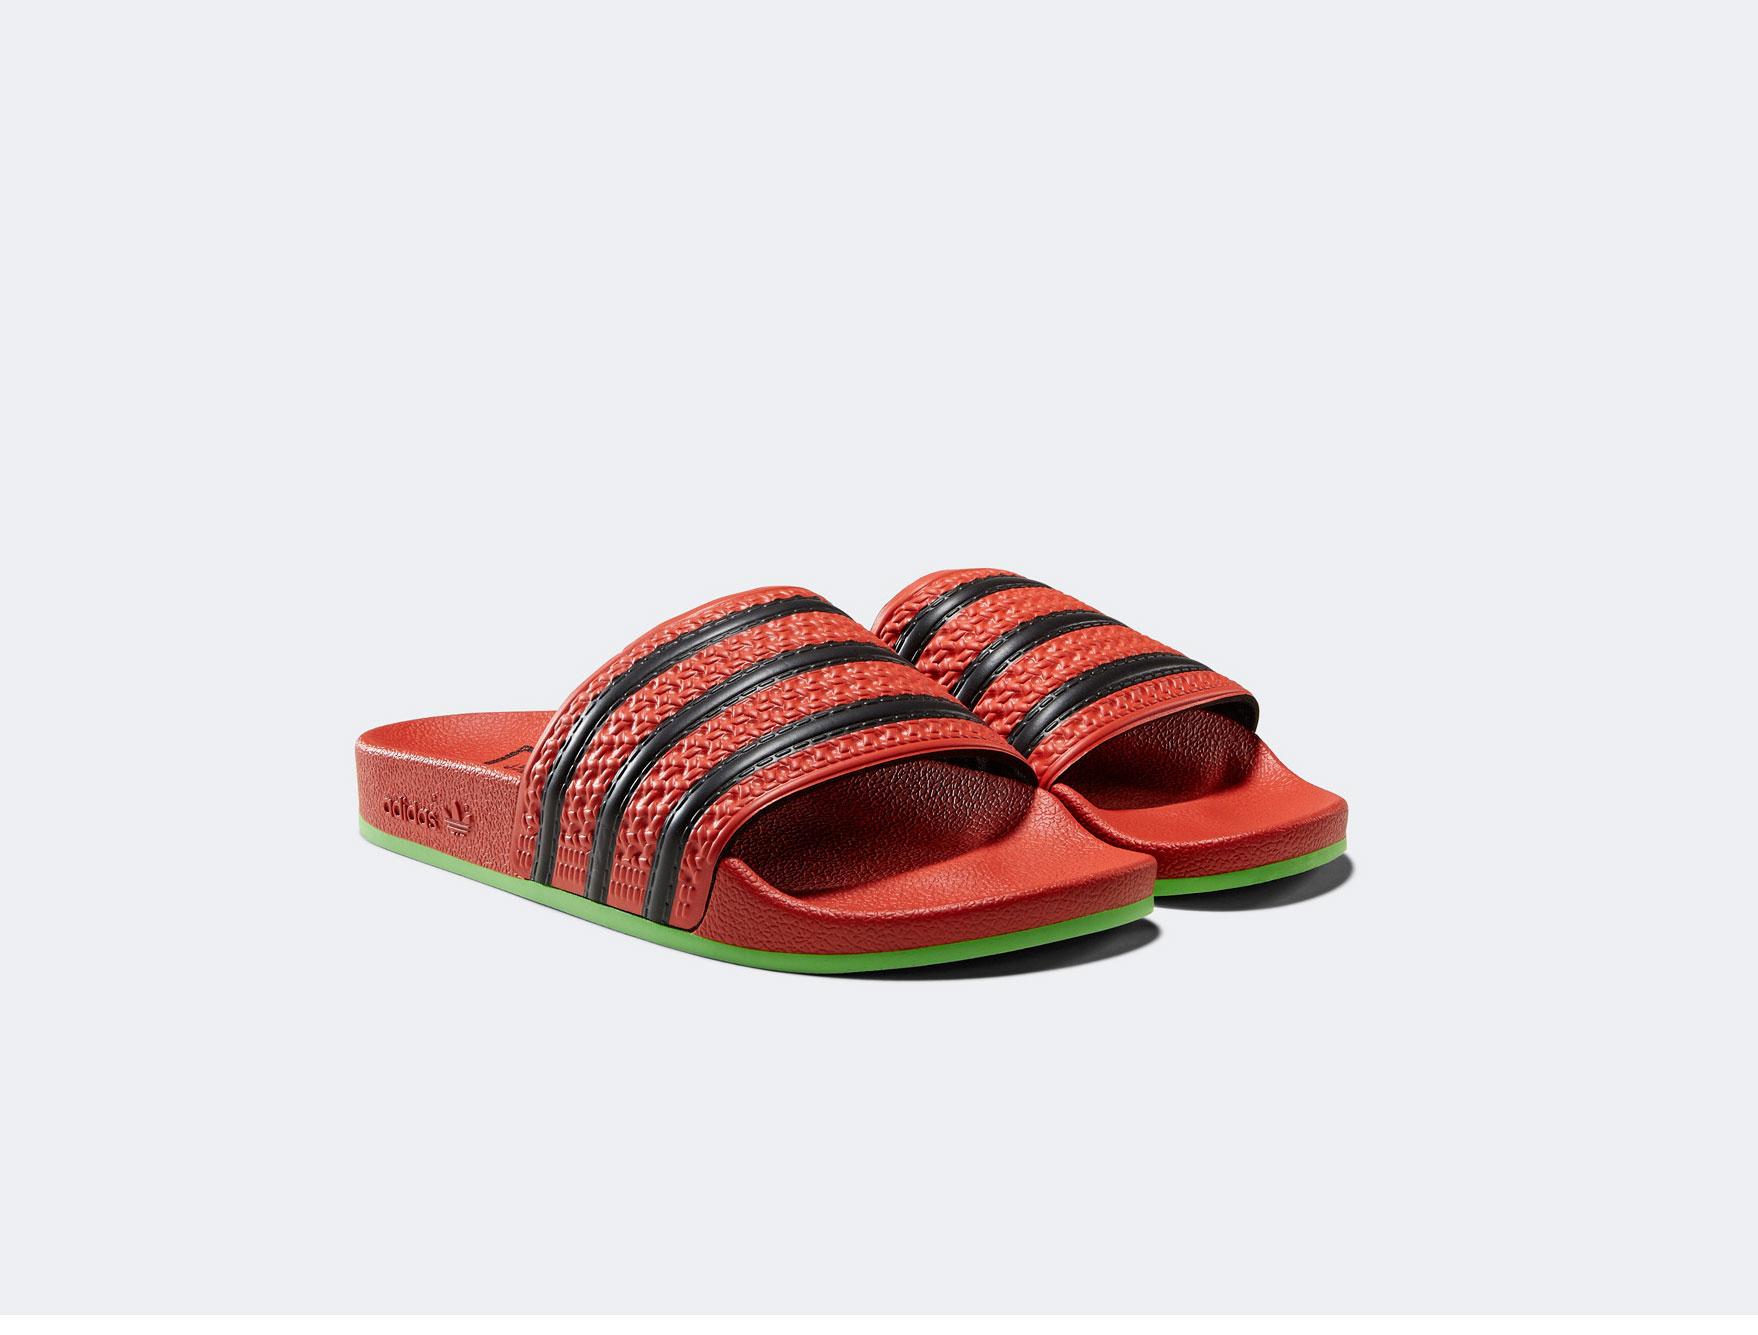 AriZona Iced Tea x Adidas Second Sneaker Collection: Pics